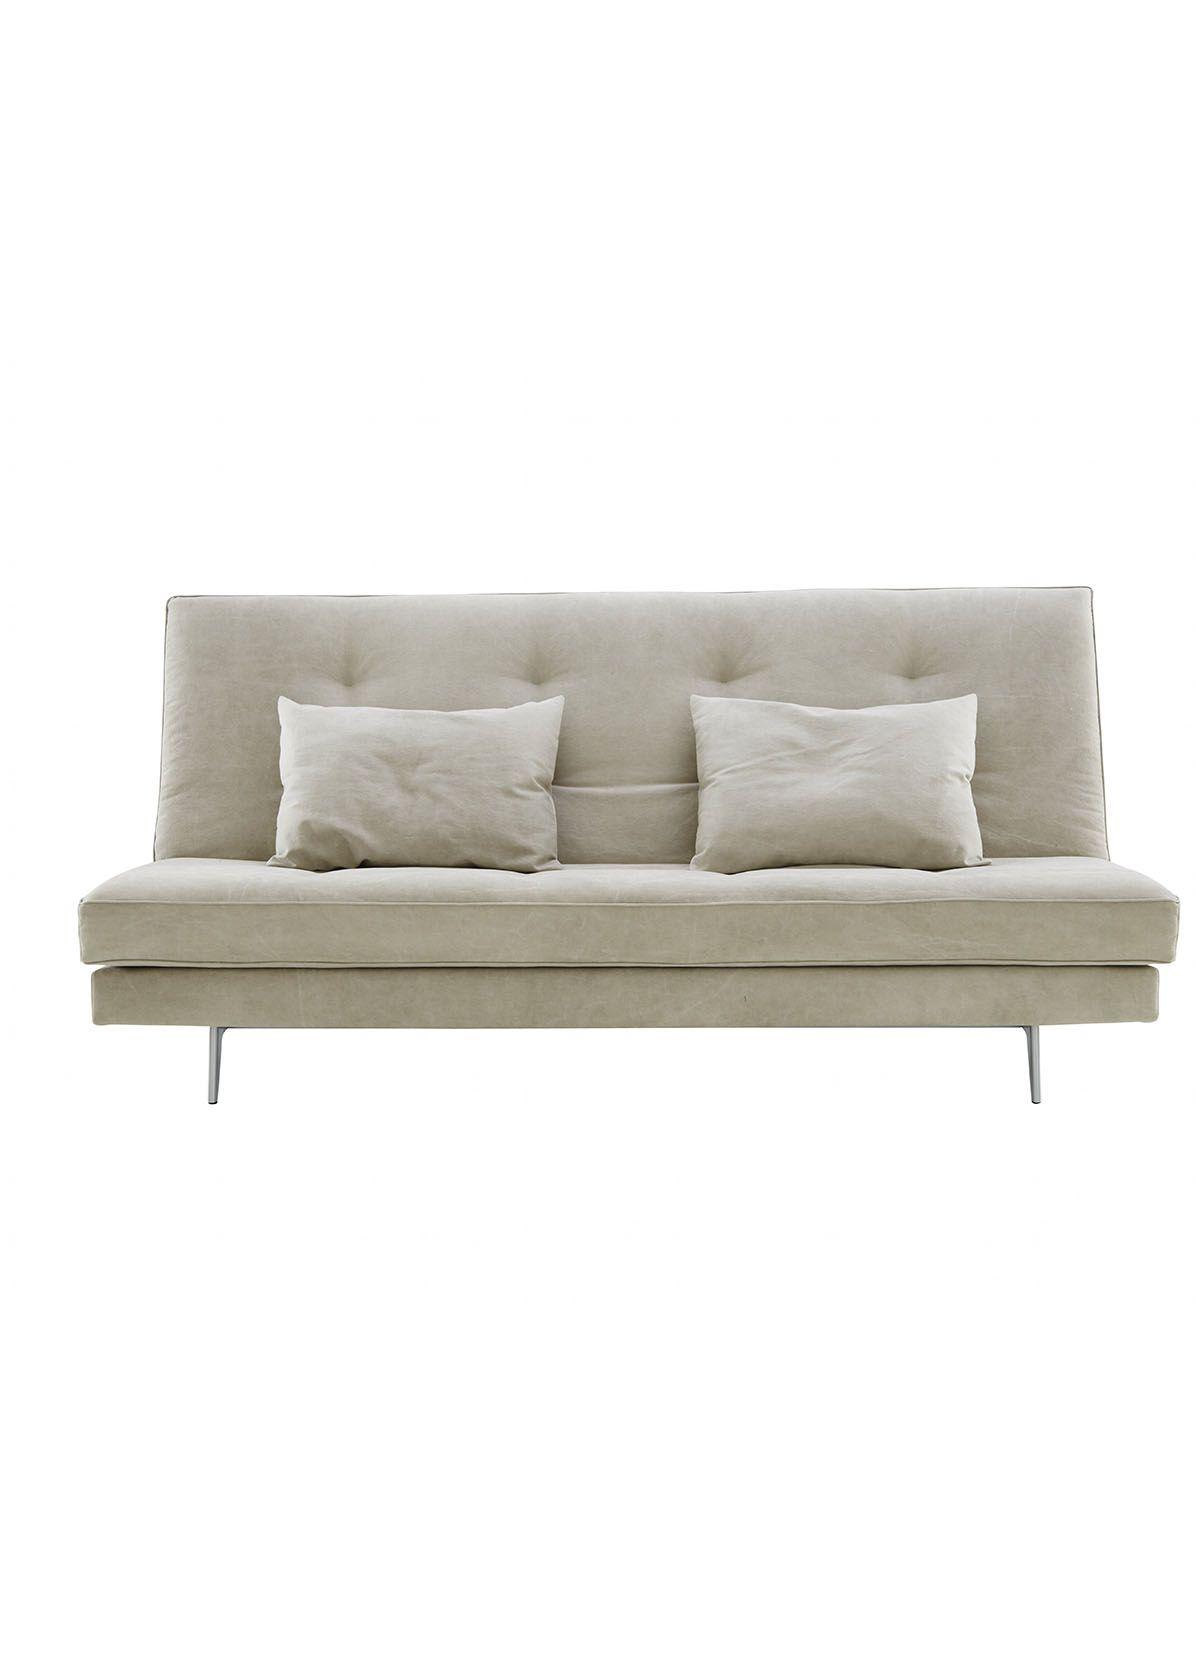 Pin On Sofa Gallery